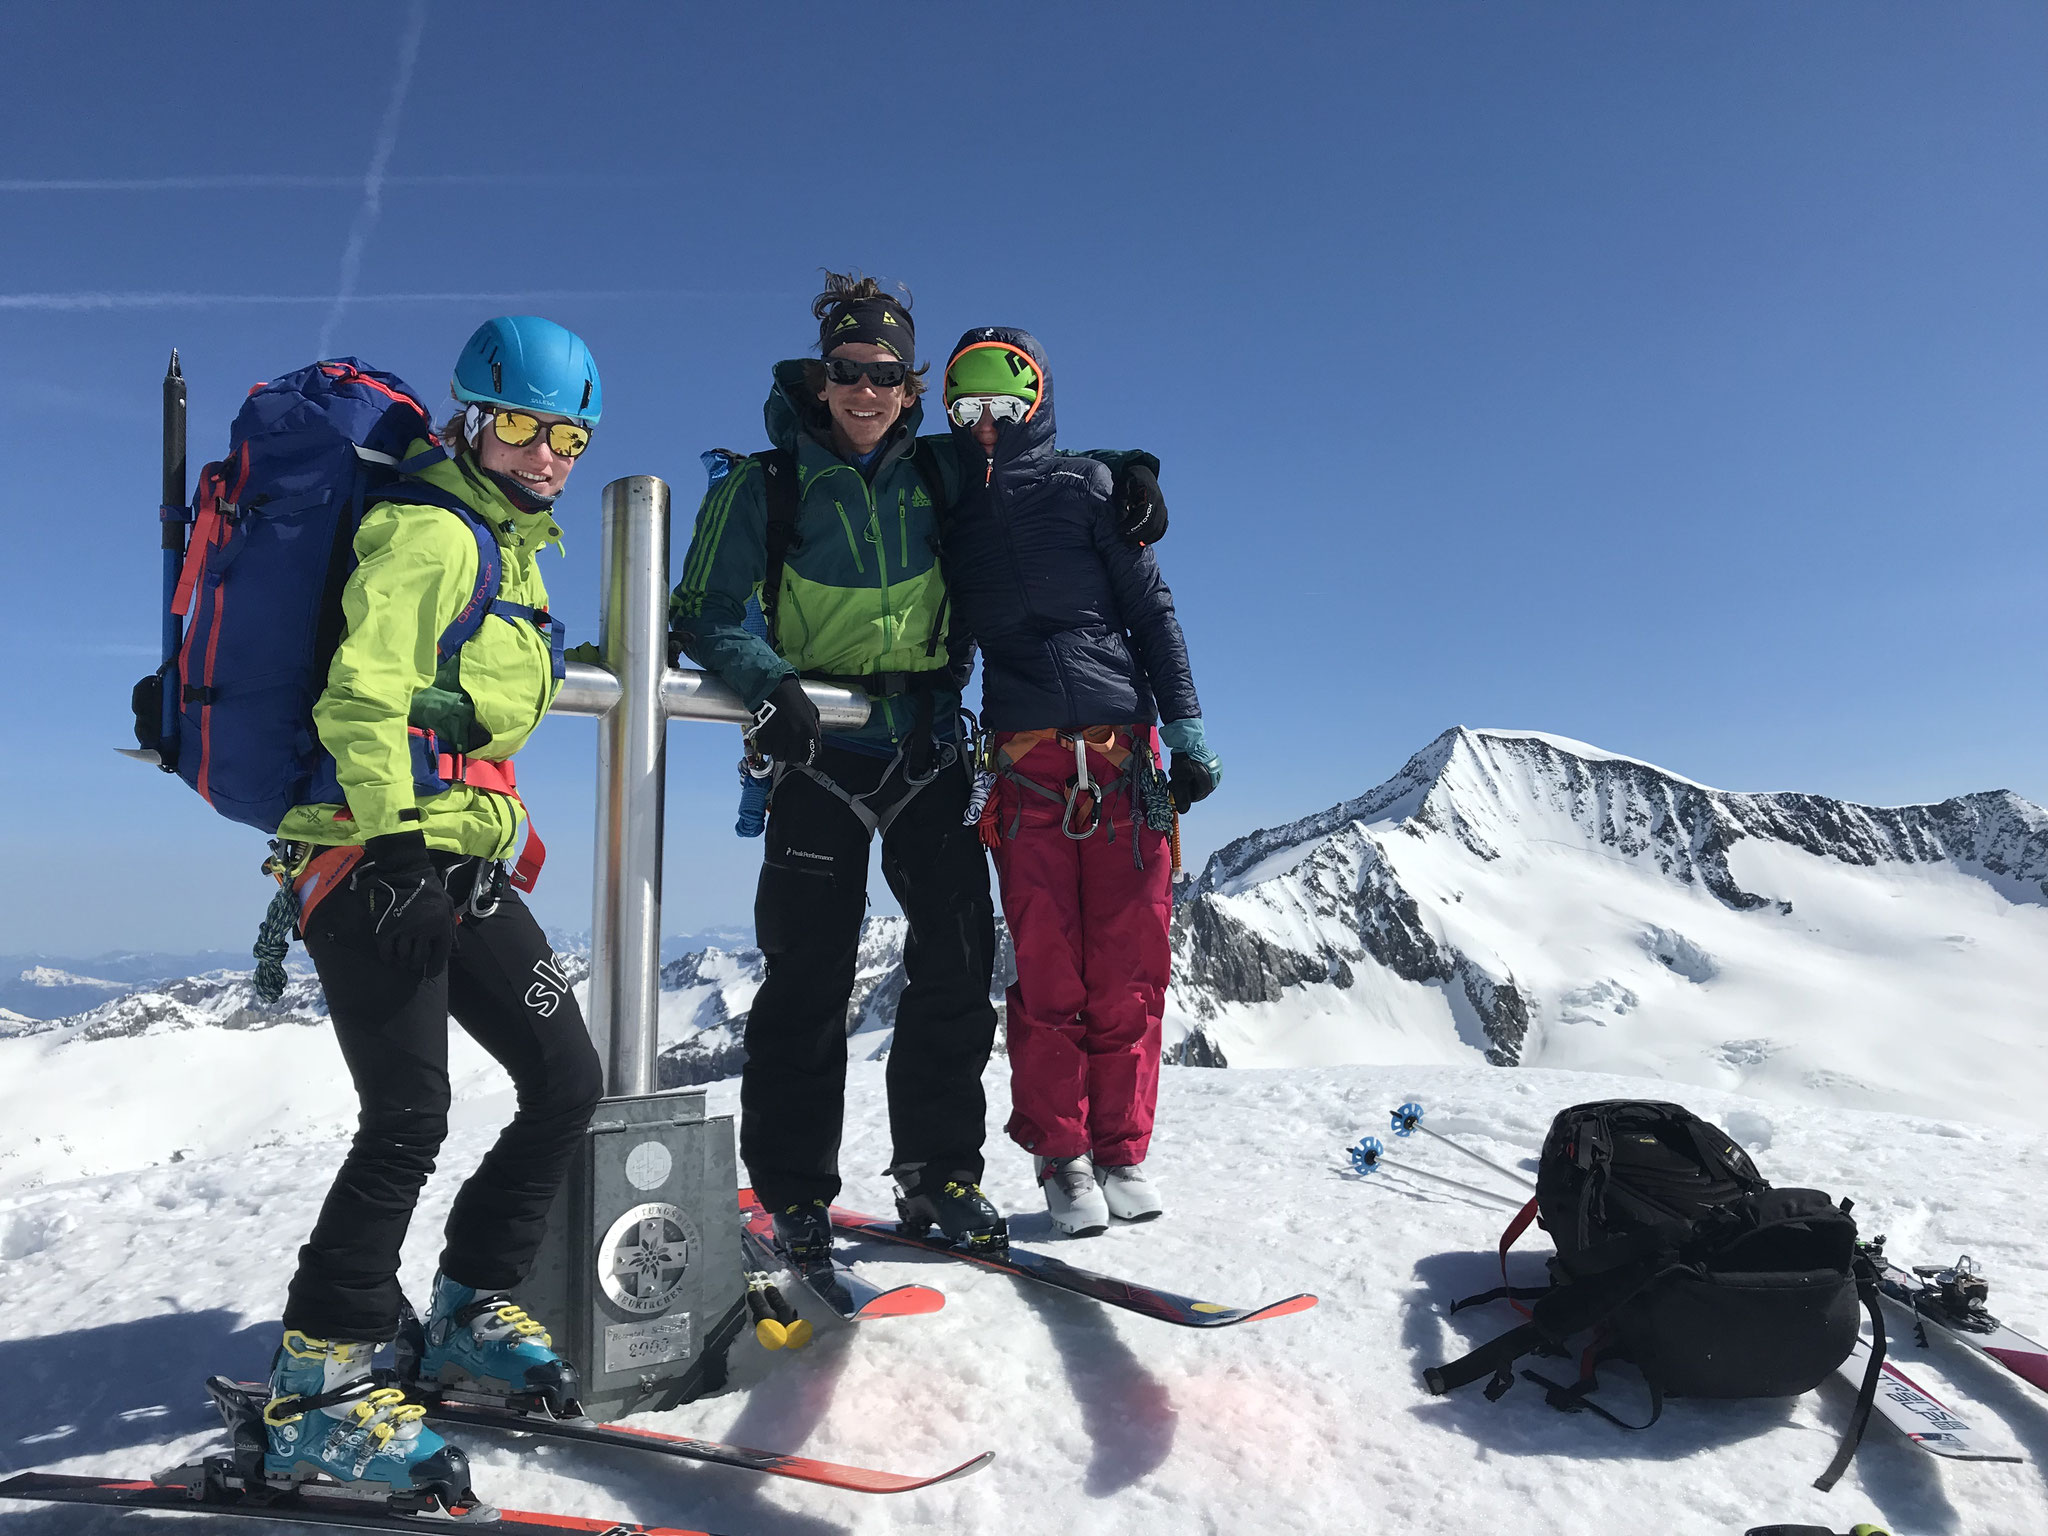 Gipfelglück am Großen Geiger - Venedigergruppe